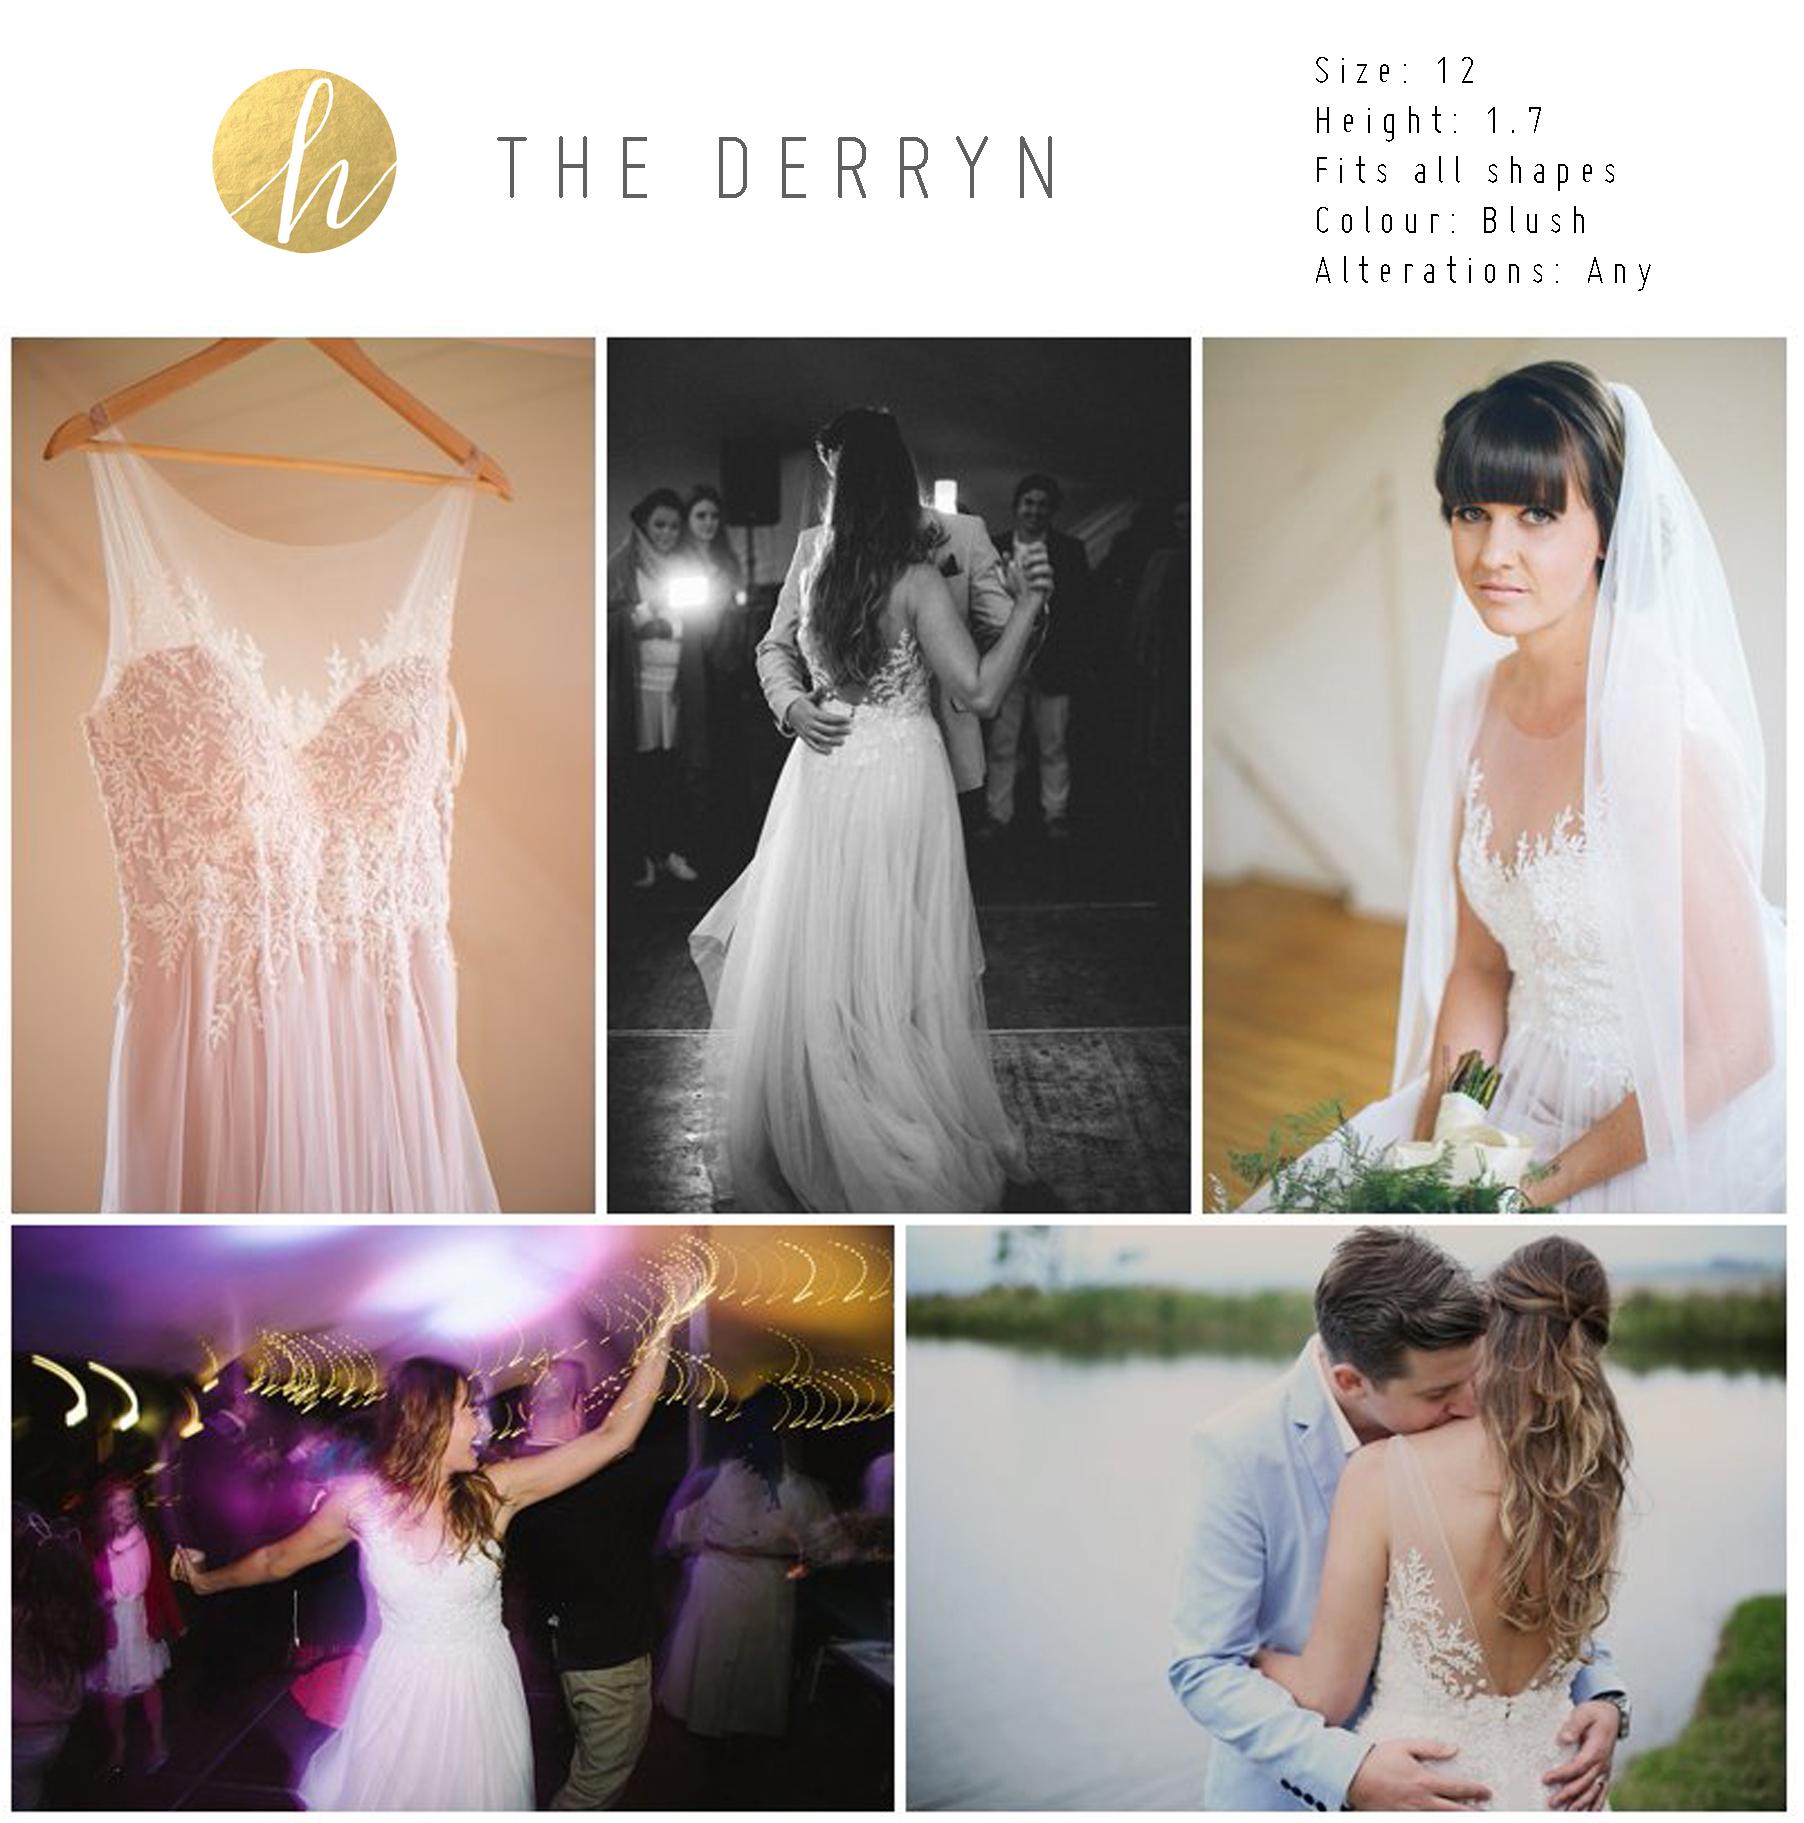 The DERRYN dress